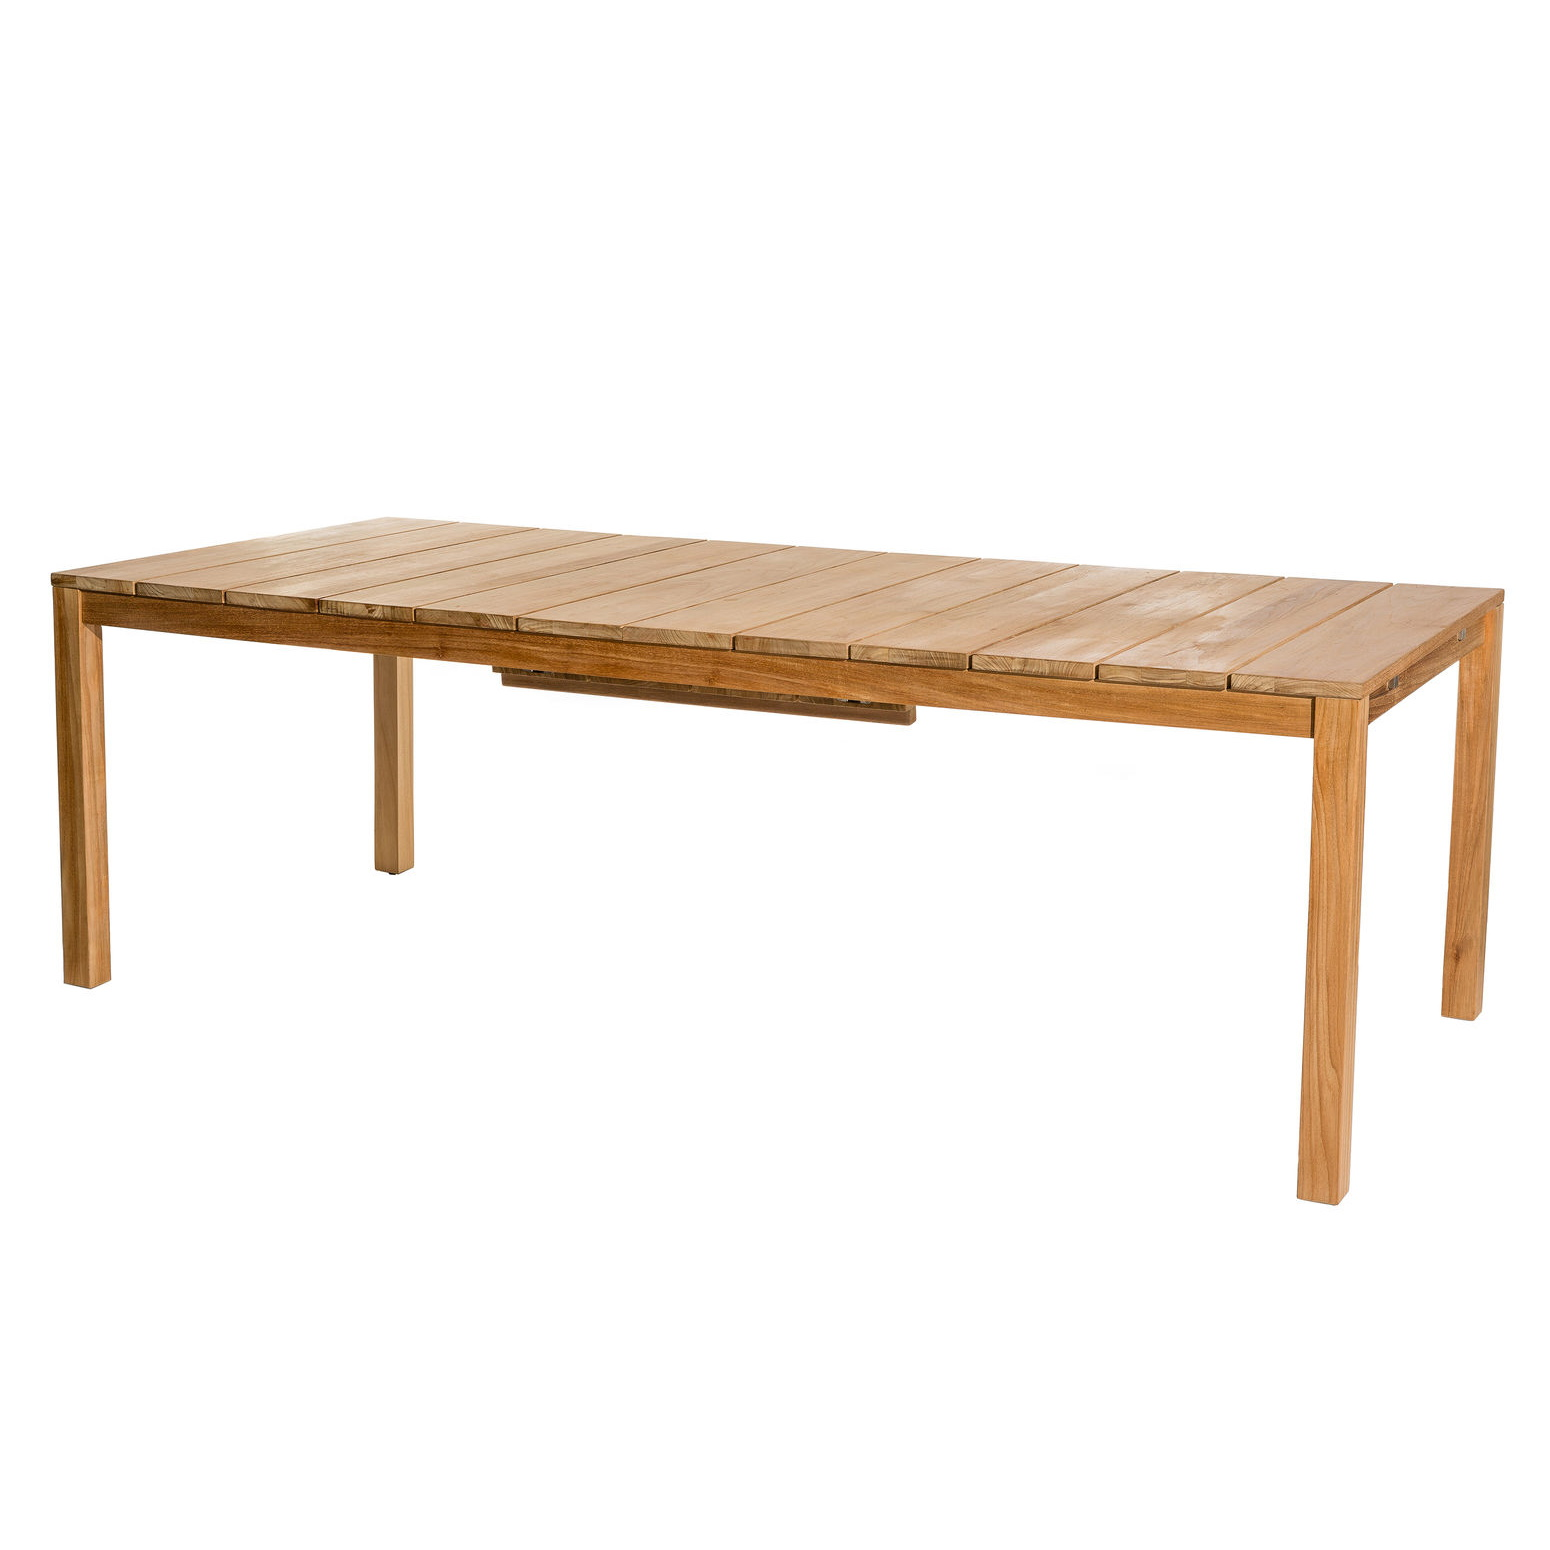 Oxnö matbord 220 - 300 cm teak, Skargaarden